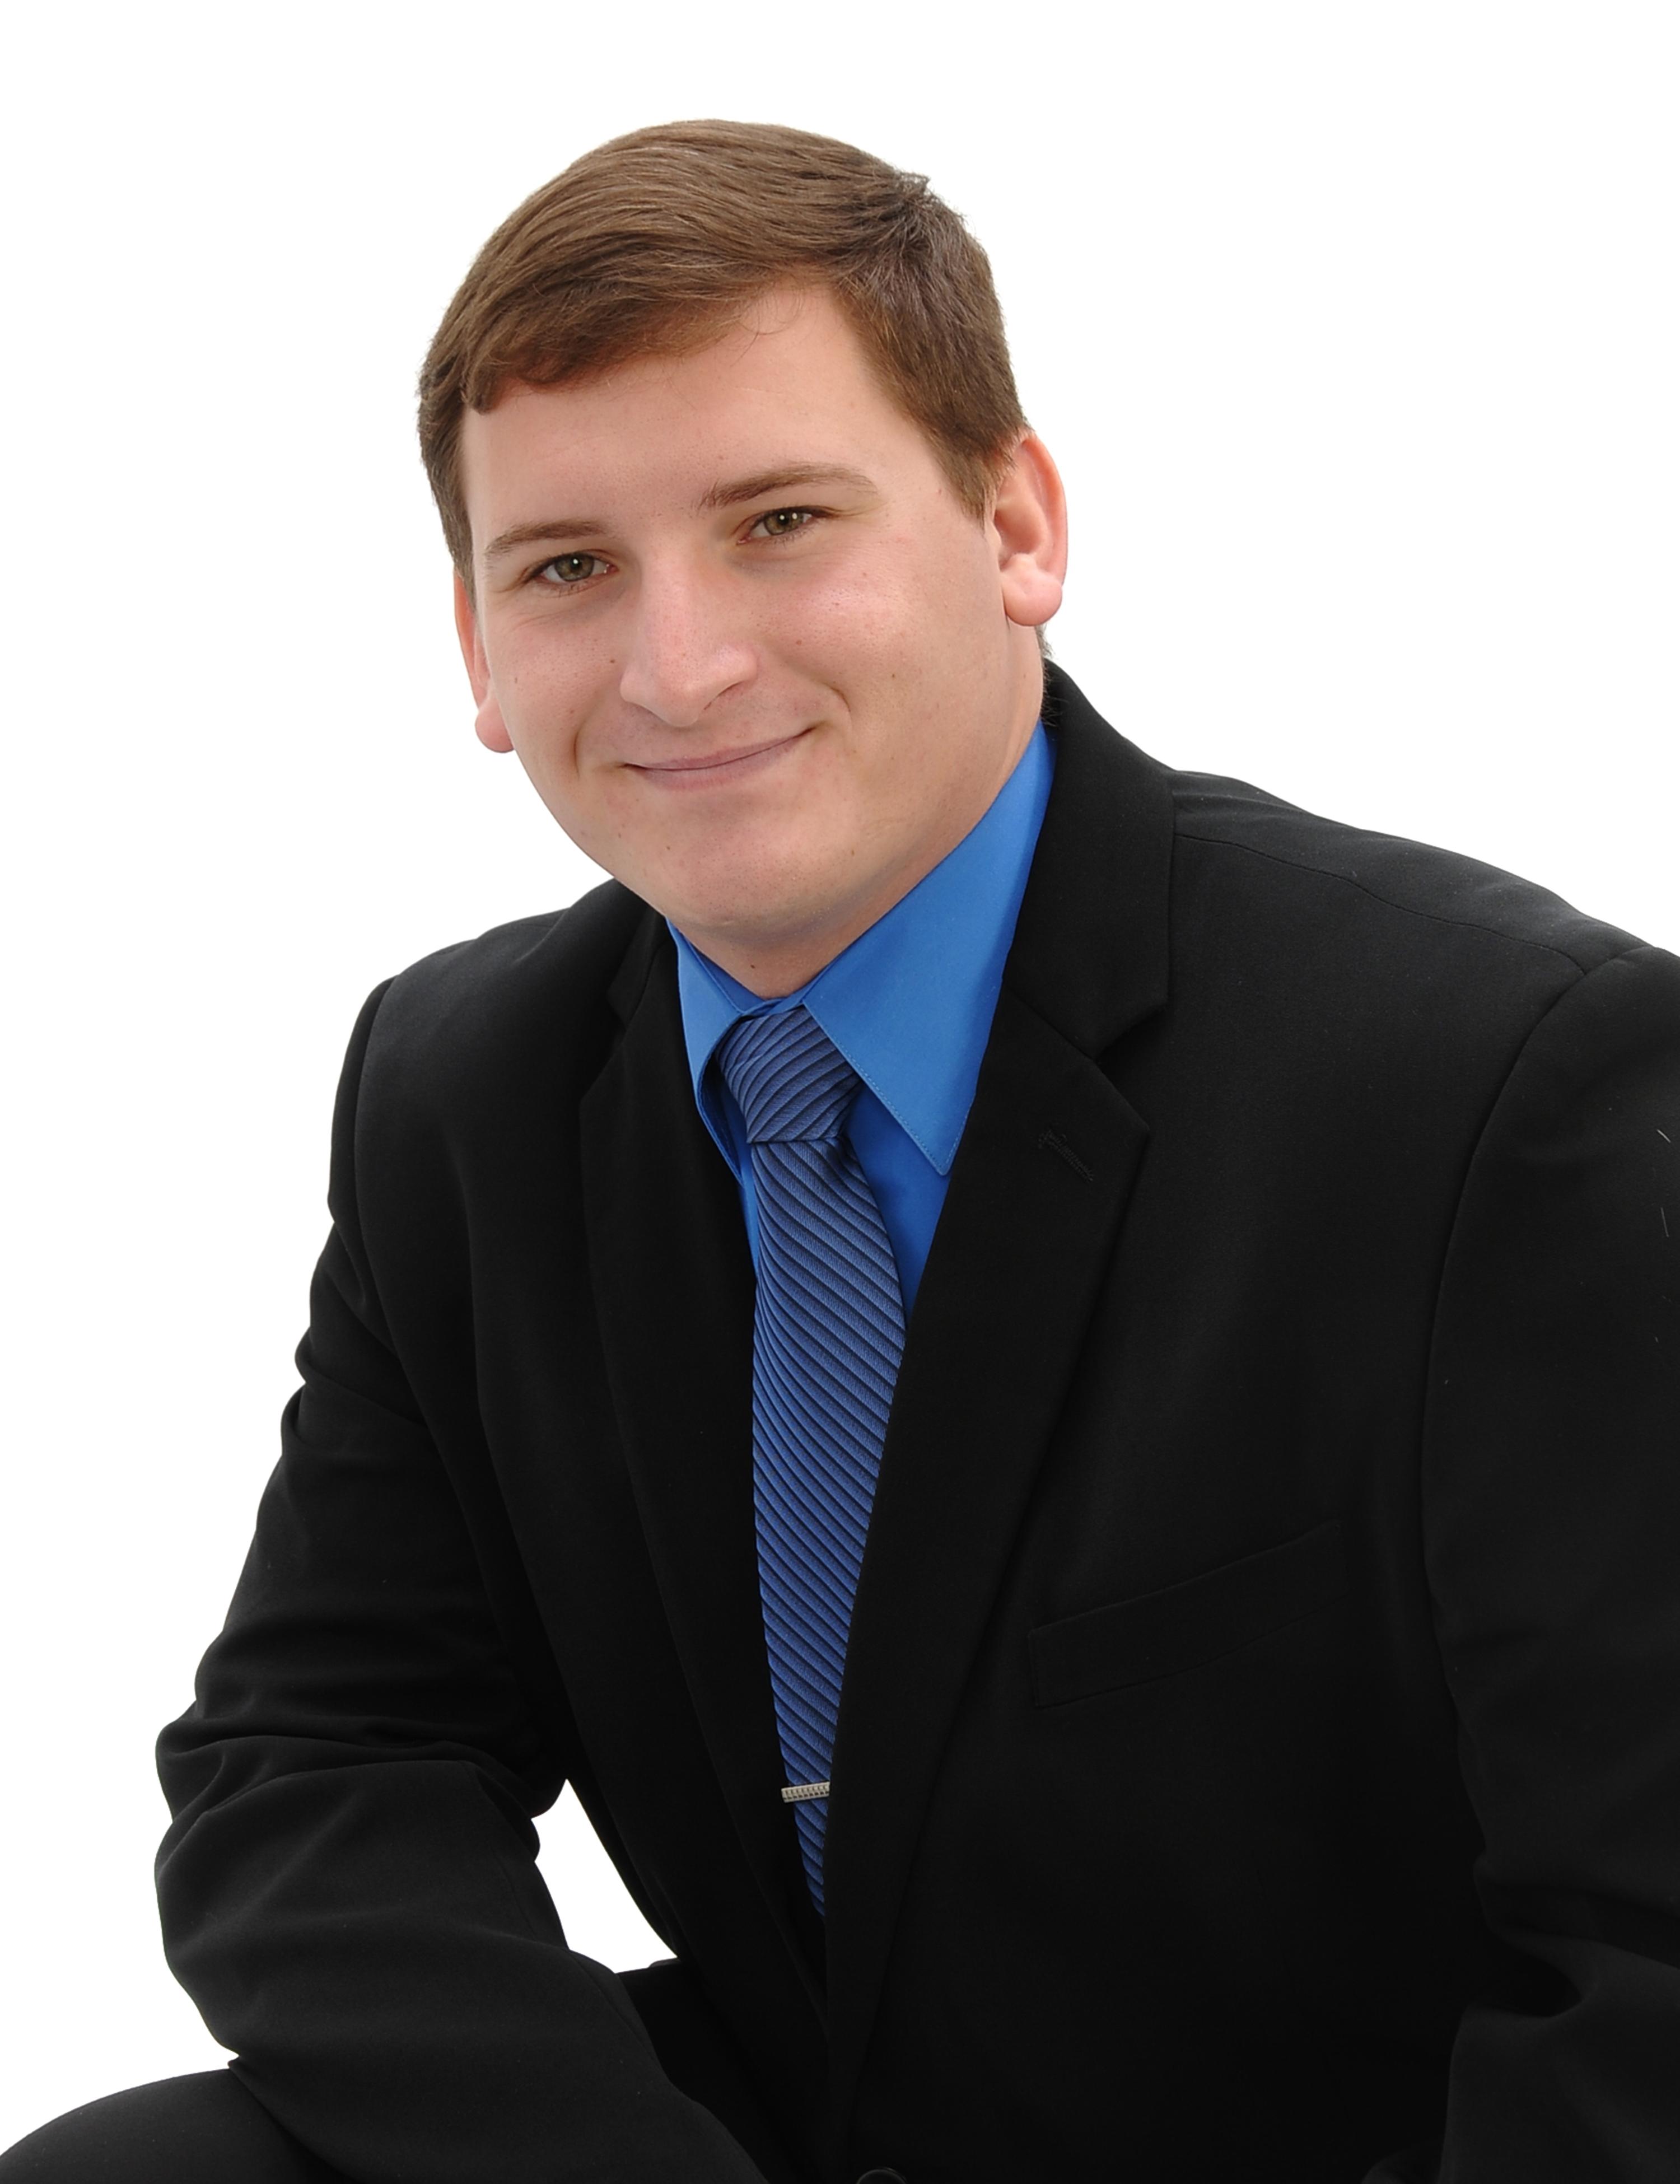 Jesse Doyle | Accounting Coordinator